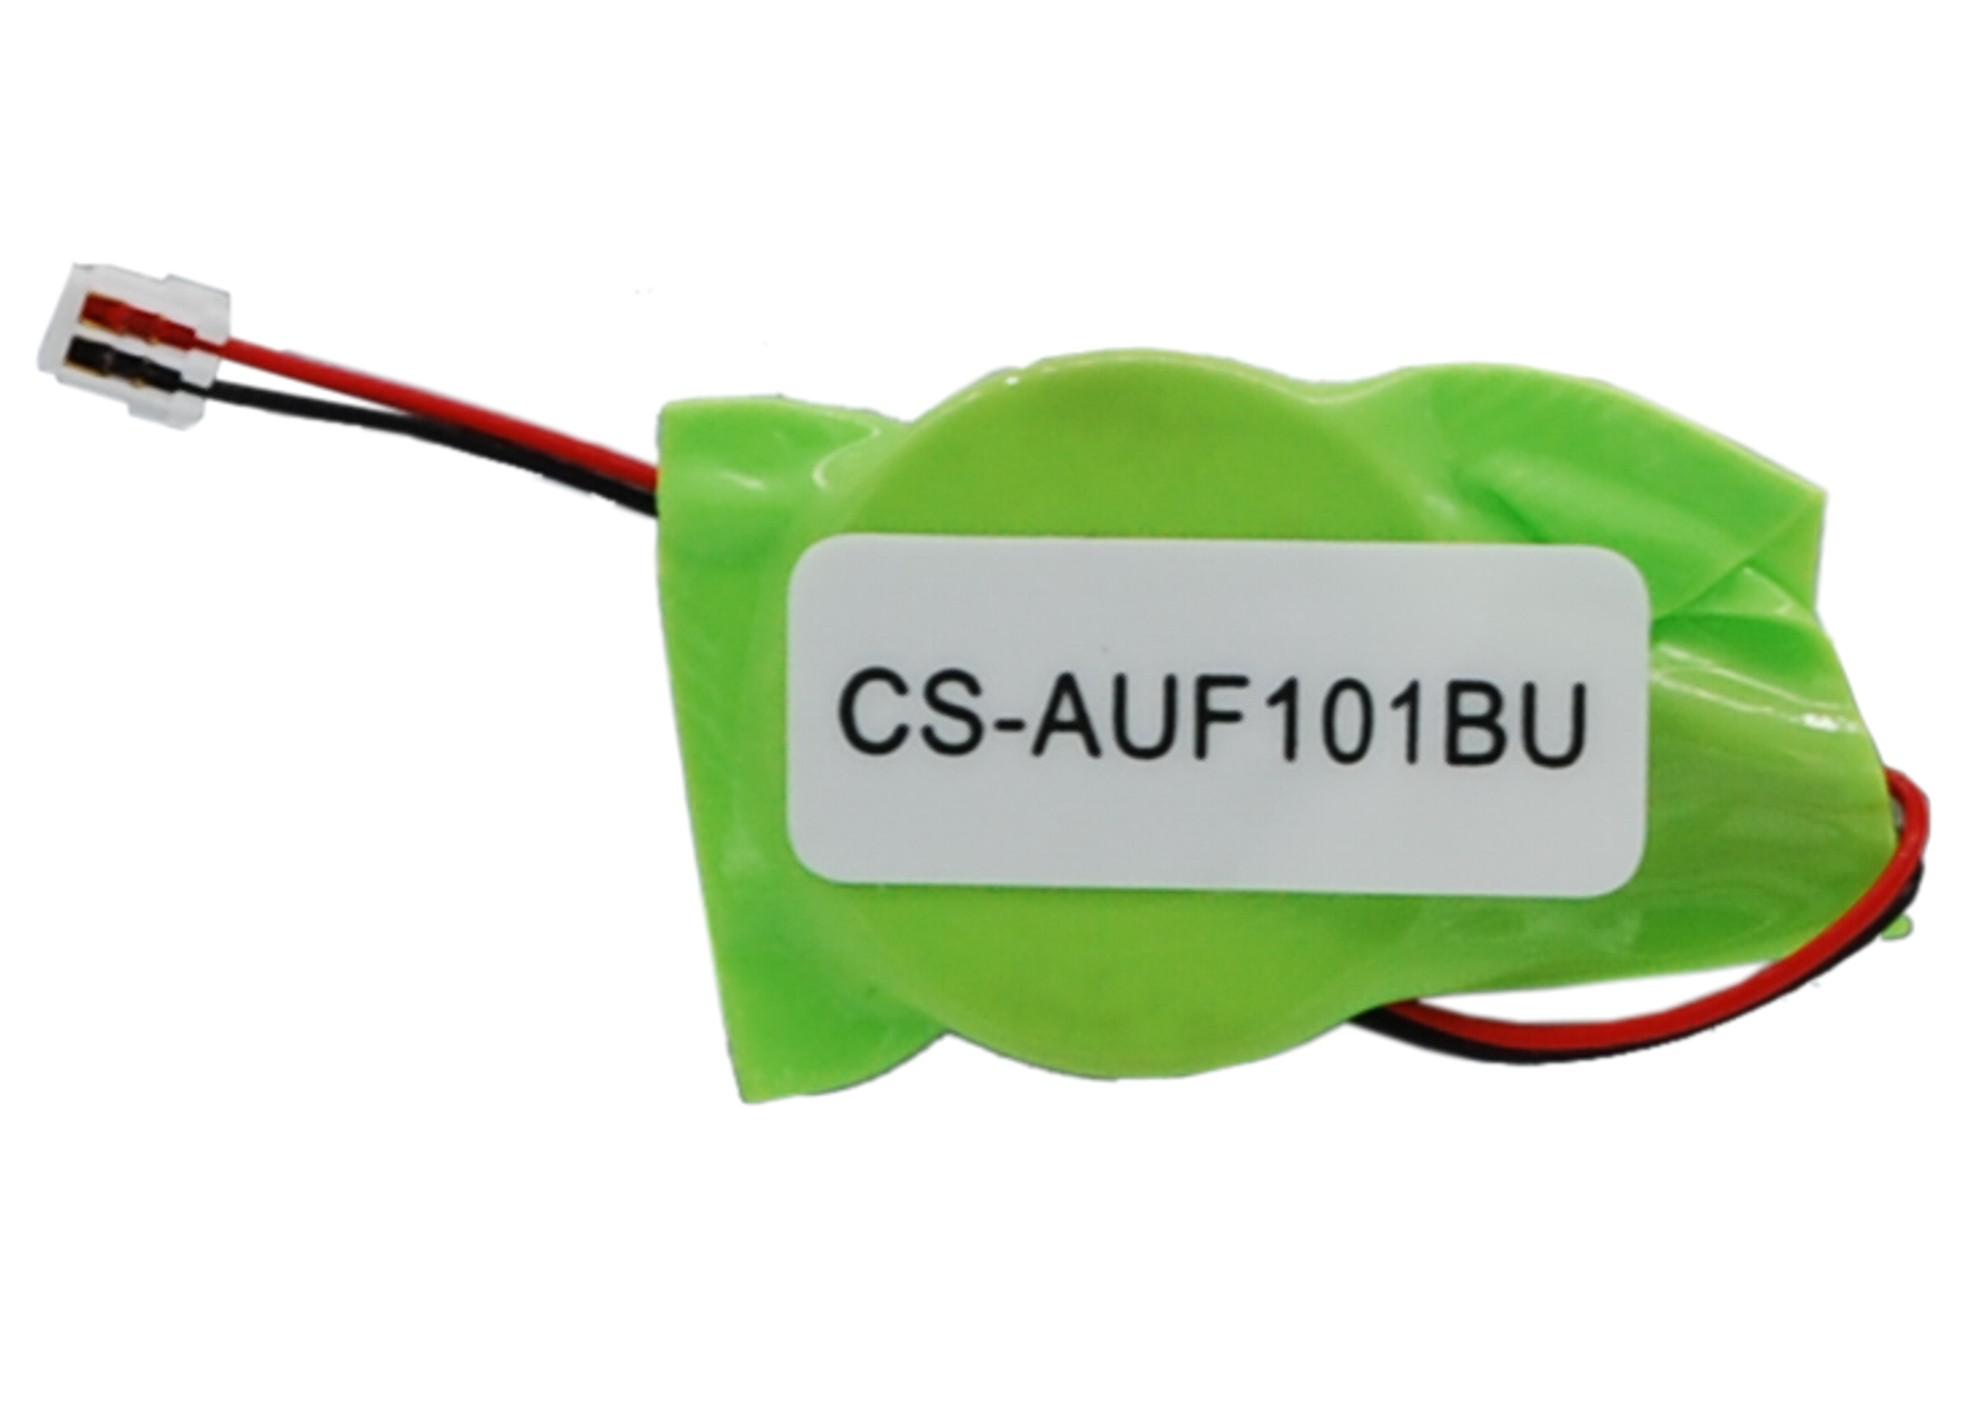 Cameron Sino baterie cmos pro ASUS Eee Pad Transformer TF101-1B004A 3V Li-ion 40mAh zelená - neoriginální